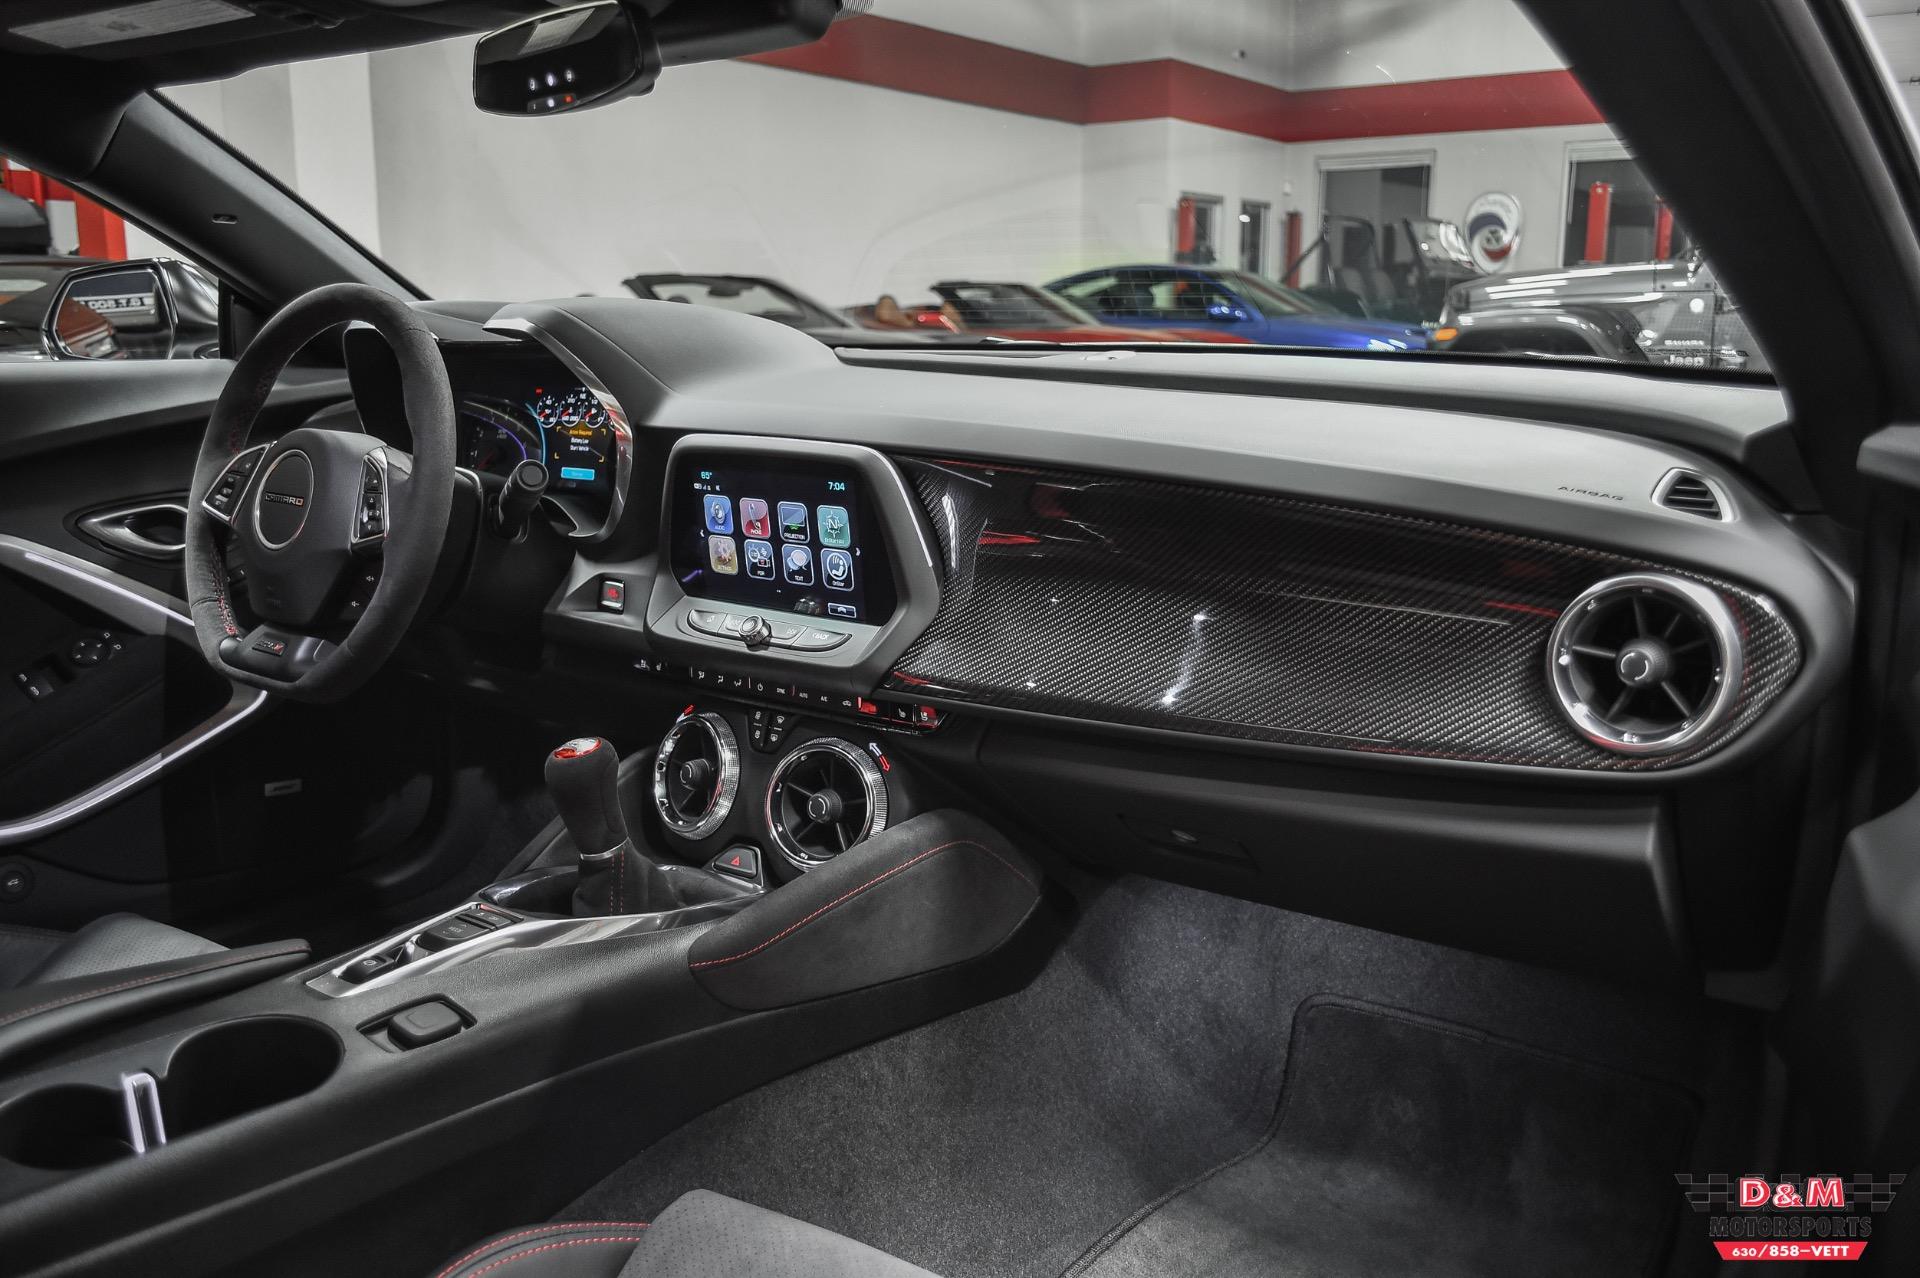 Used 2018 Chevrolet Camaro ZL1 Coupe | Glen Ellyn, IL